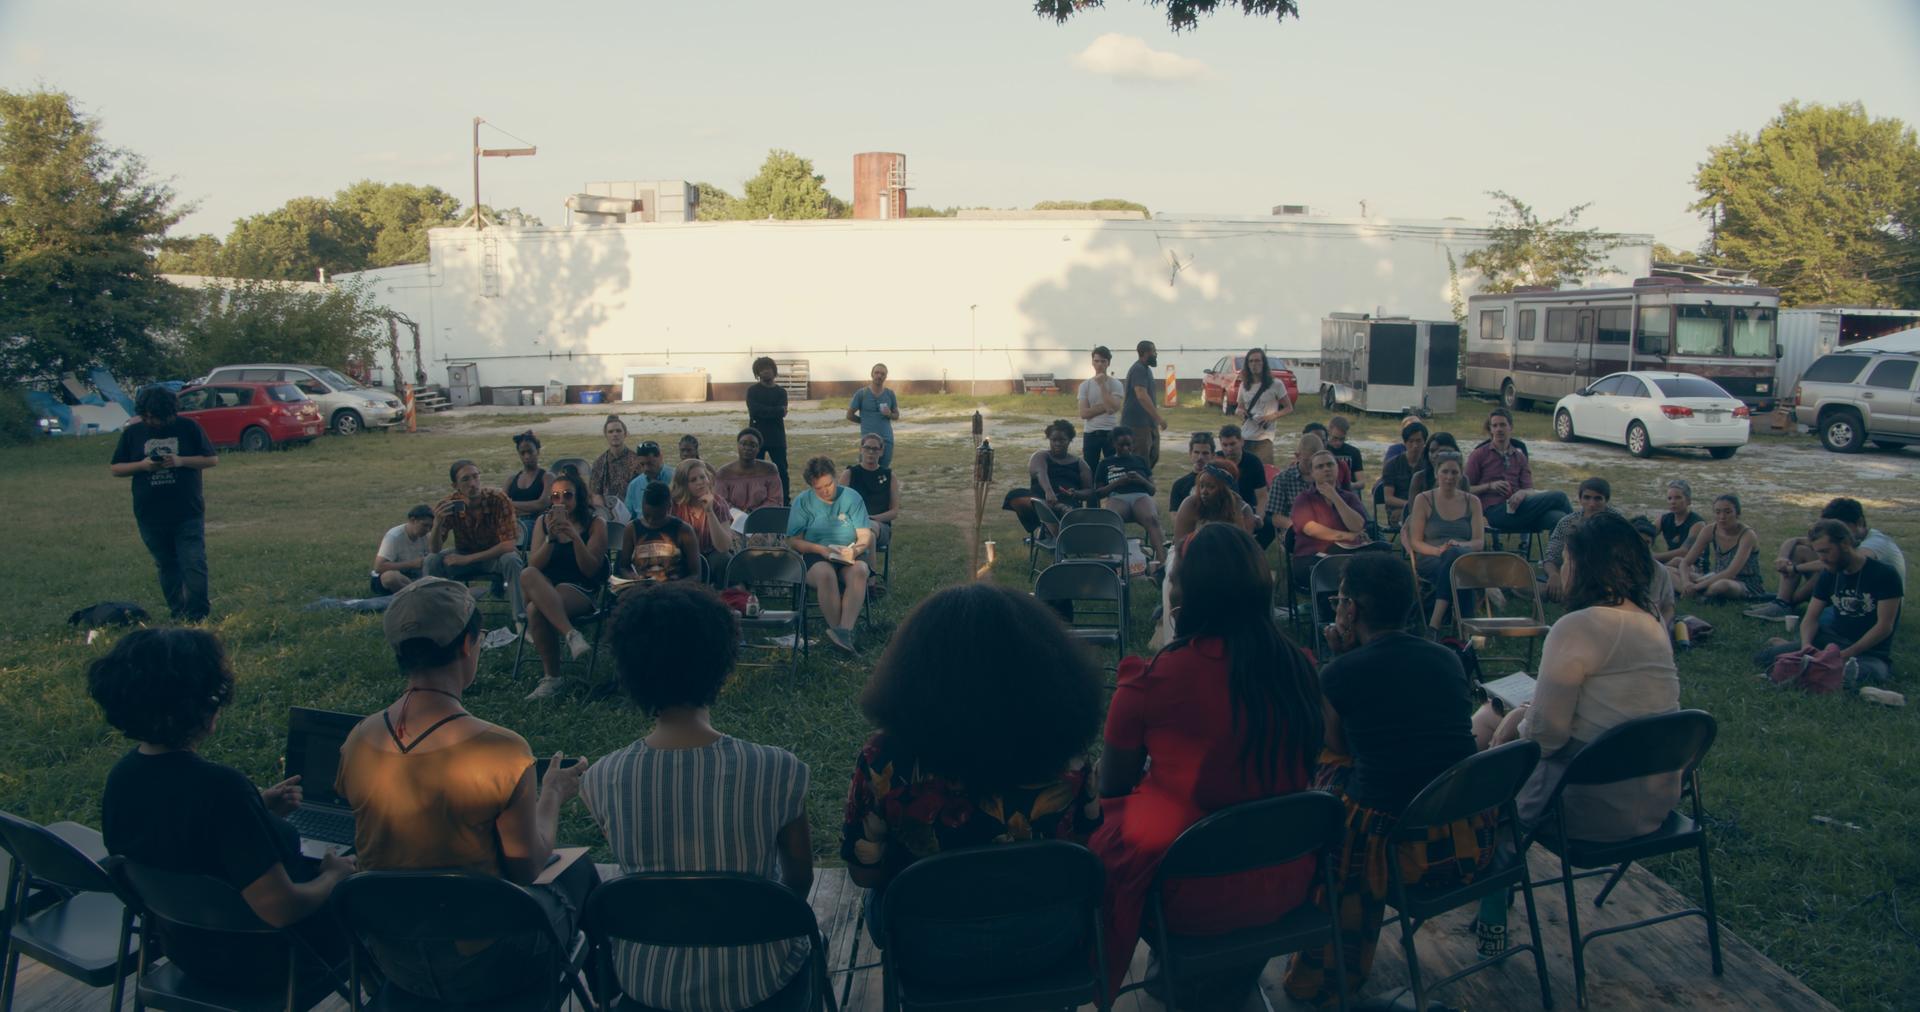 Convergence - Summer Solstice 2019